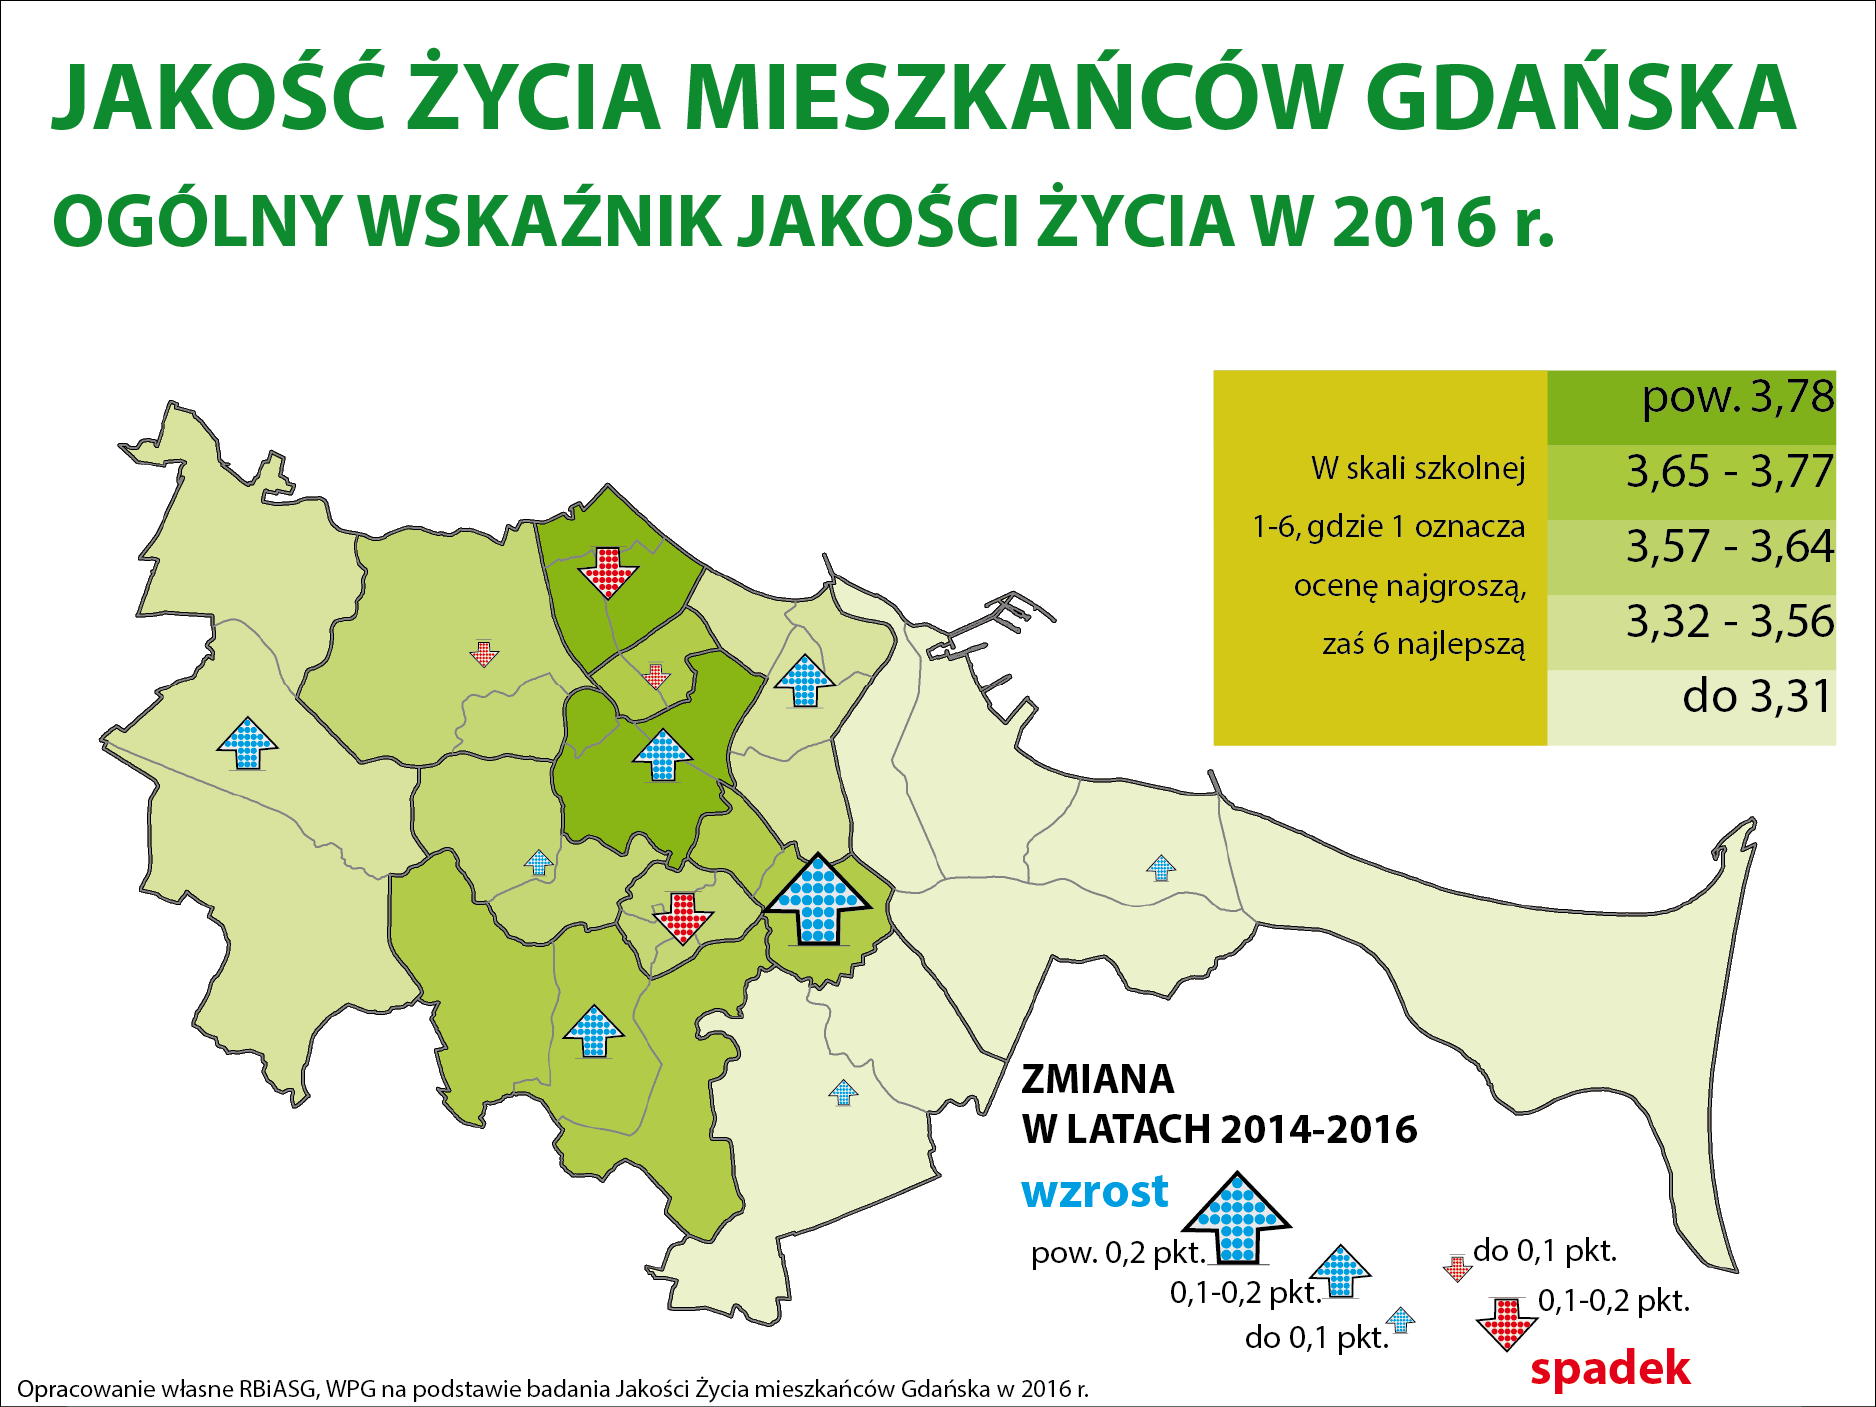 Jakość Życia 2016 - Gdańsk